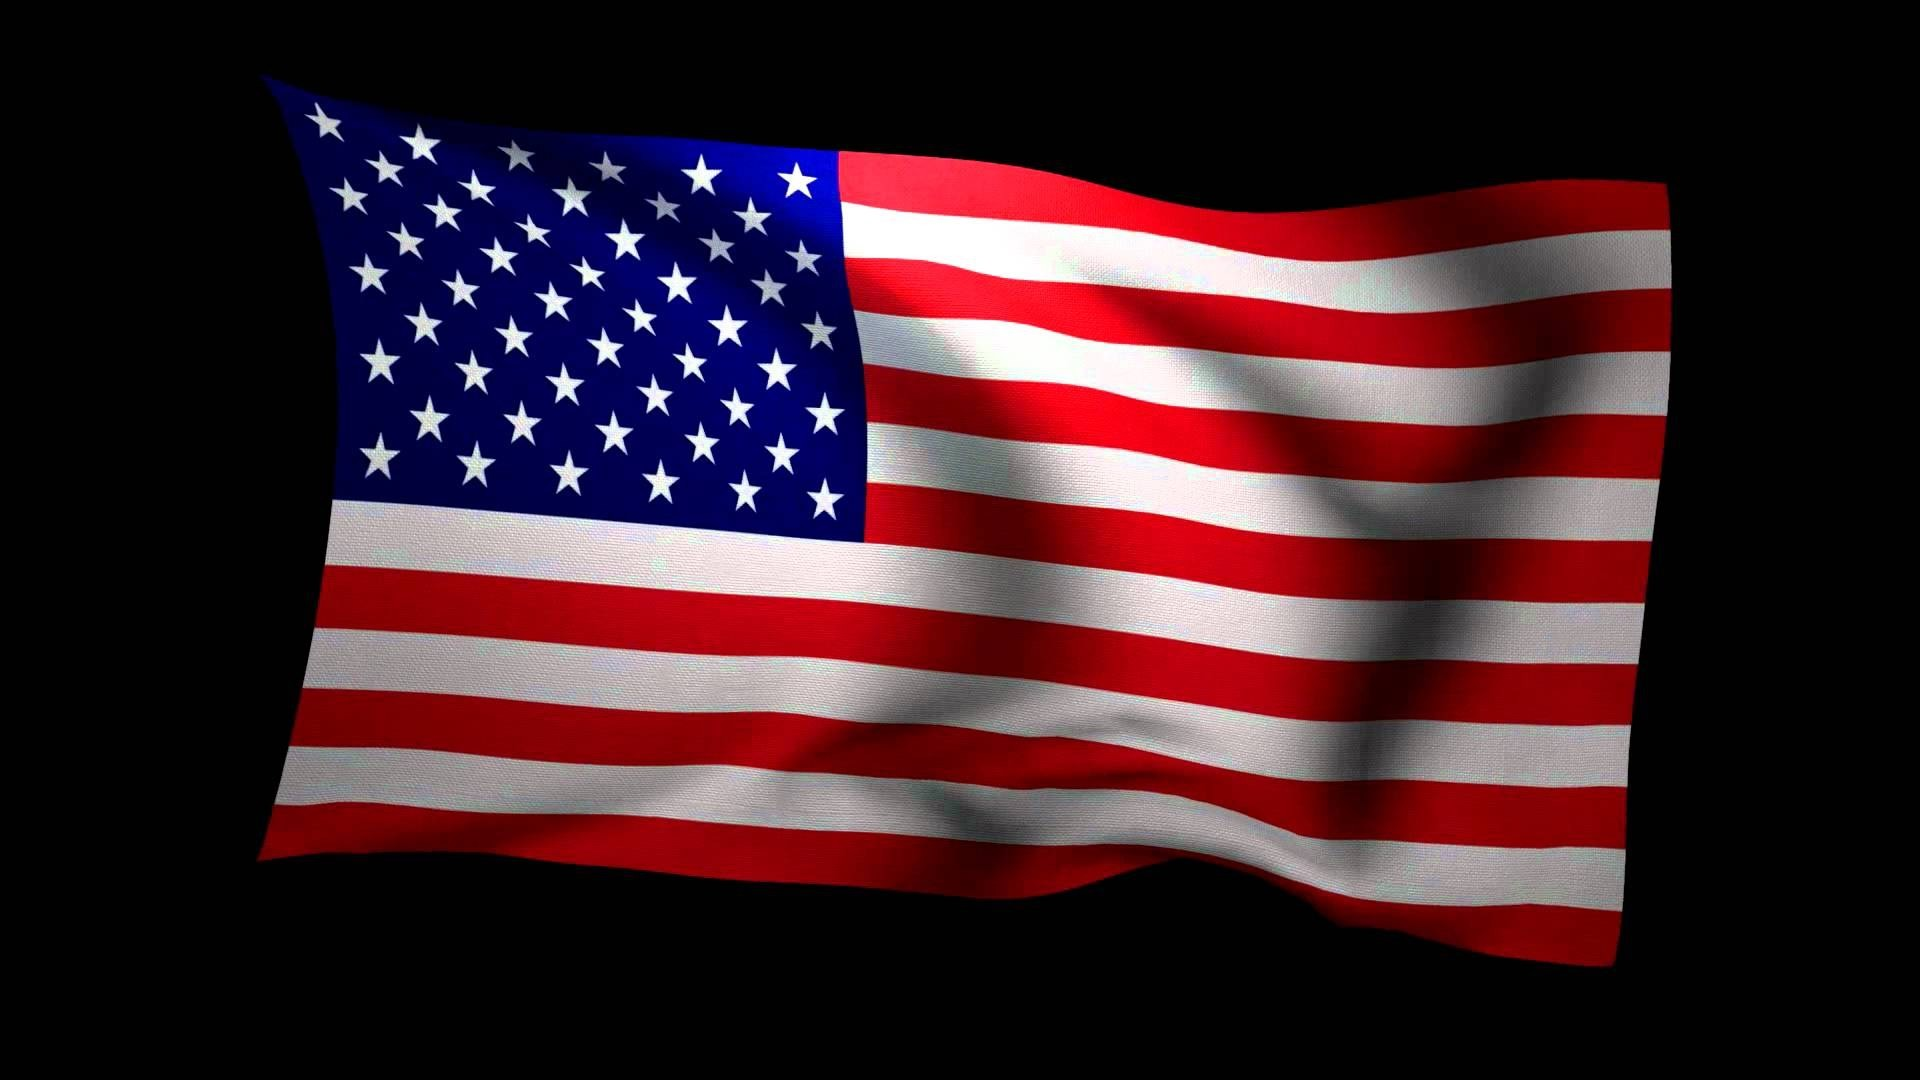 … american flag desktop wallpaper free 178 kb by …